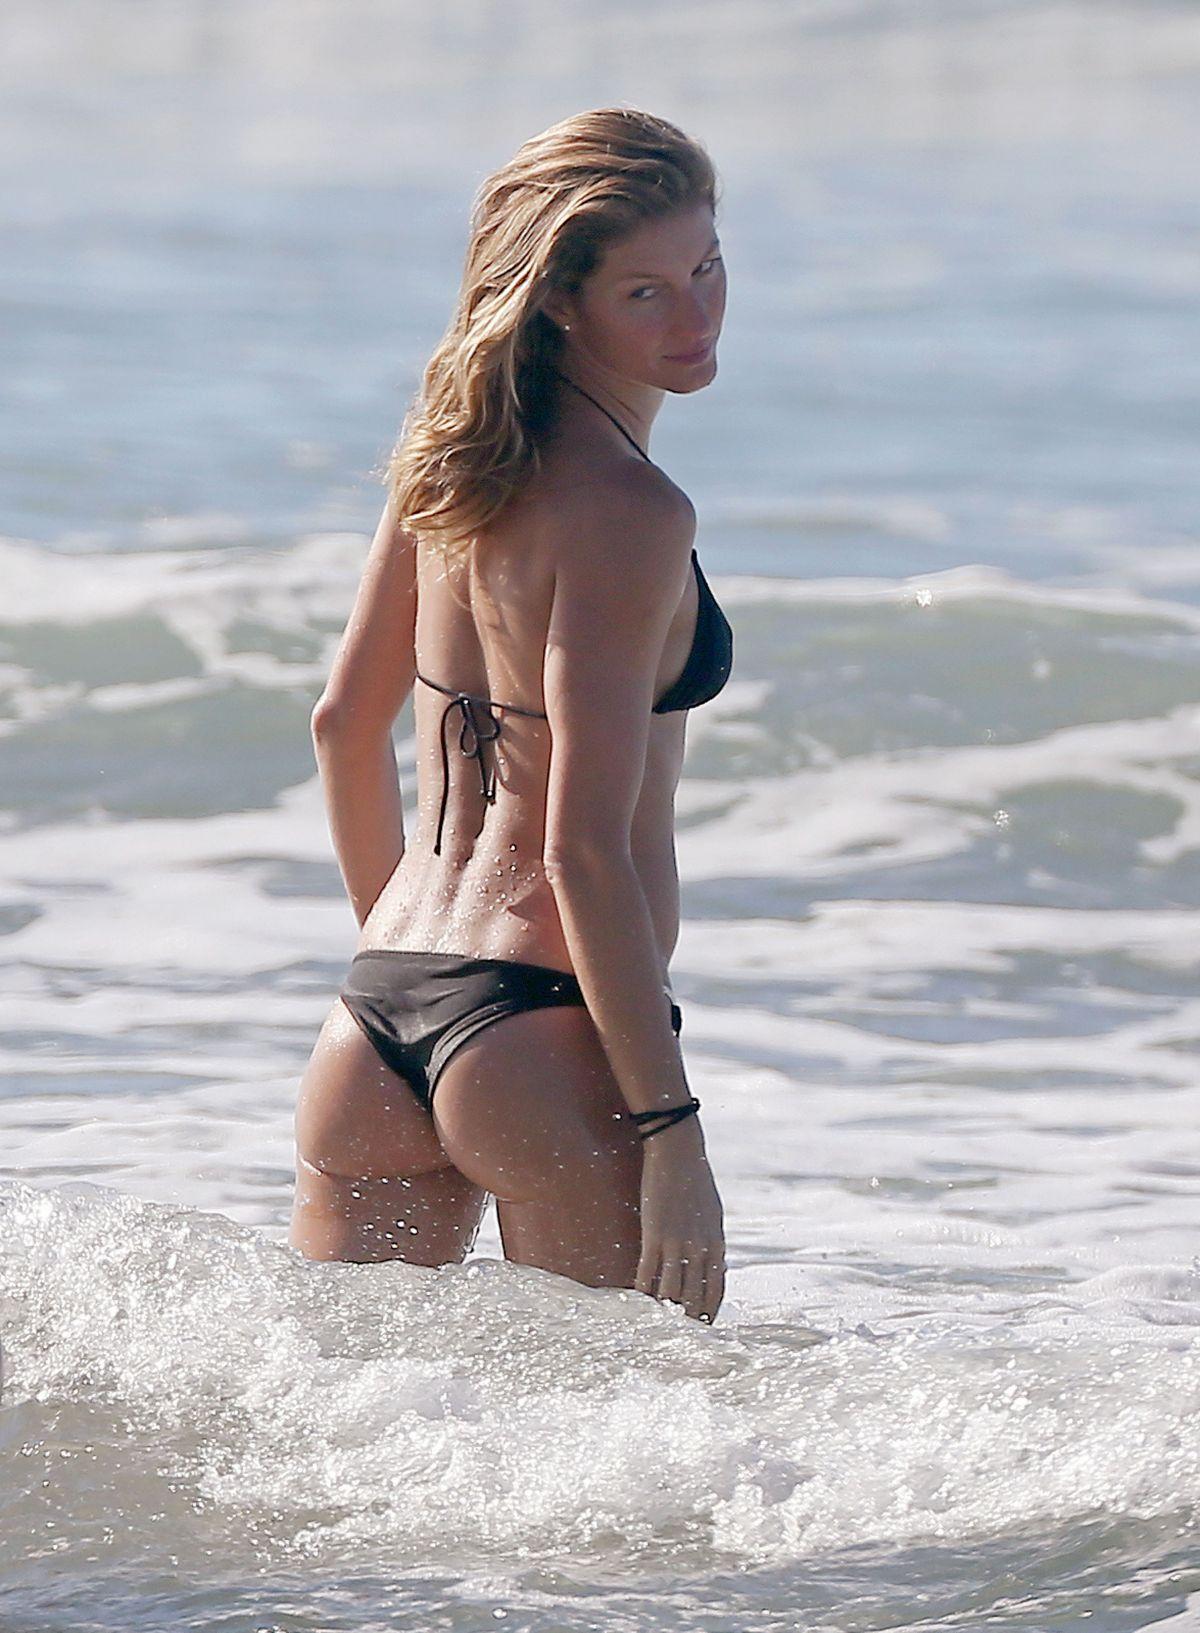 costa Gisele bundchen rica bikini